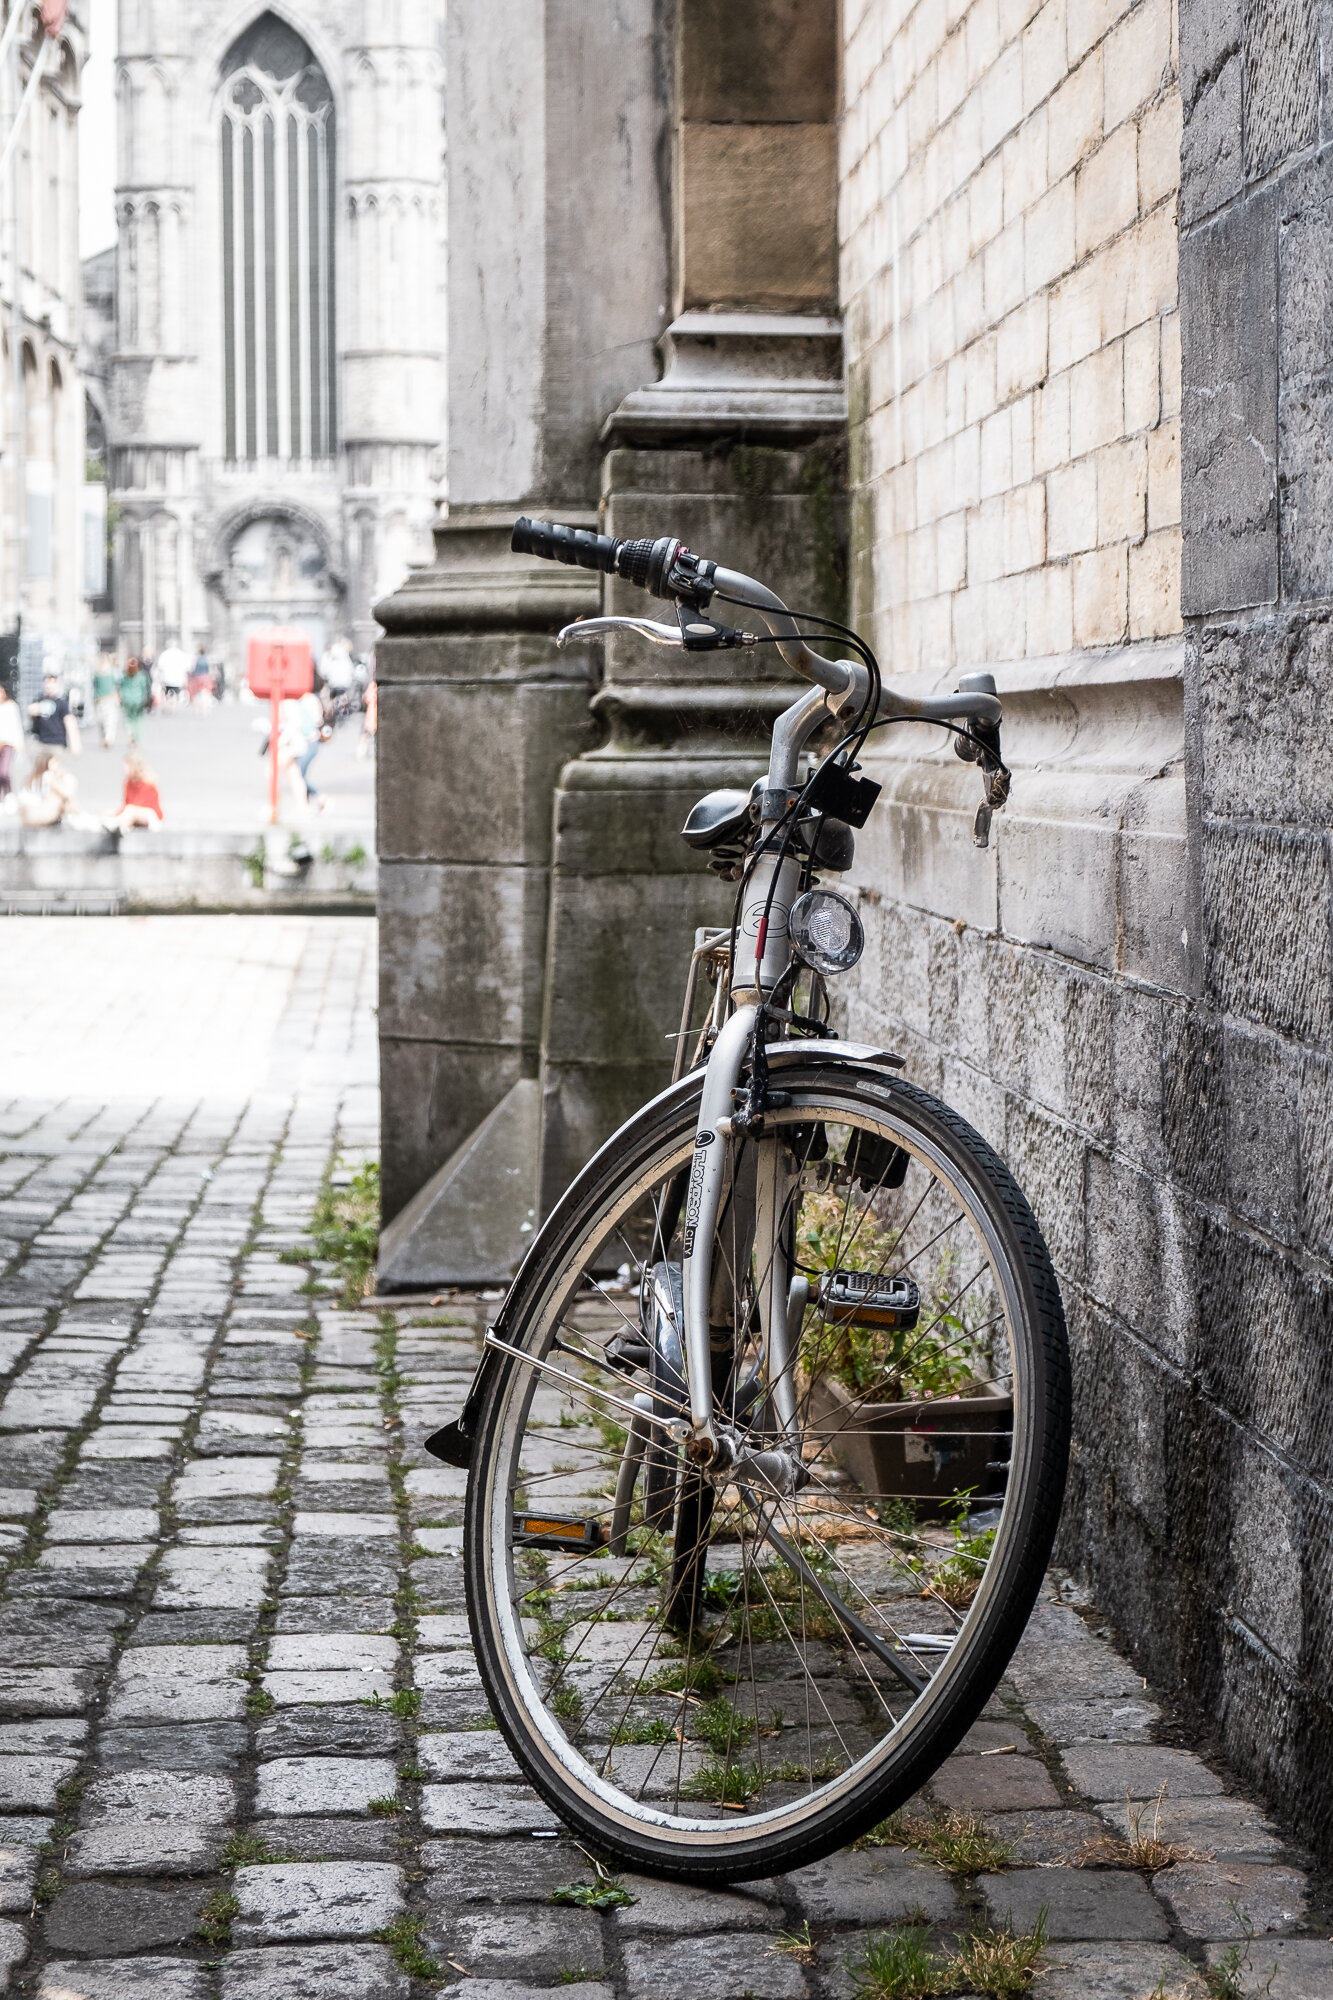 A bike leaning against Saint Michael's Bridge